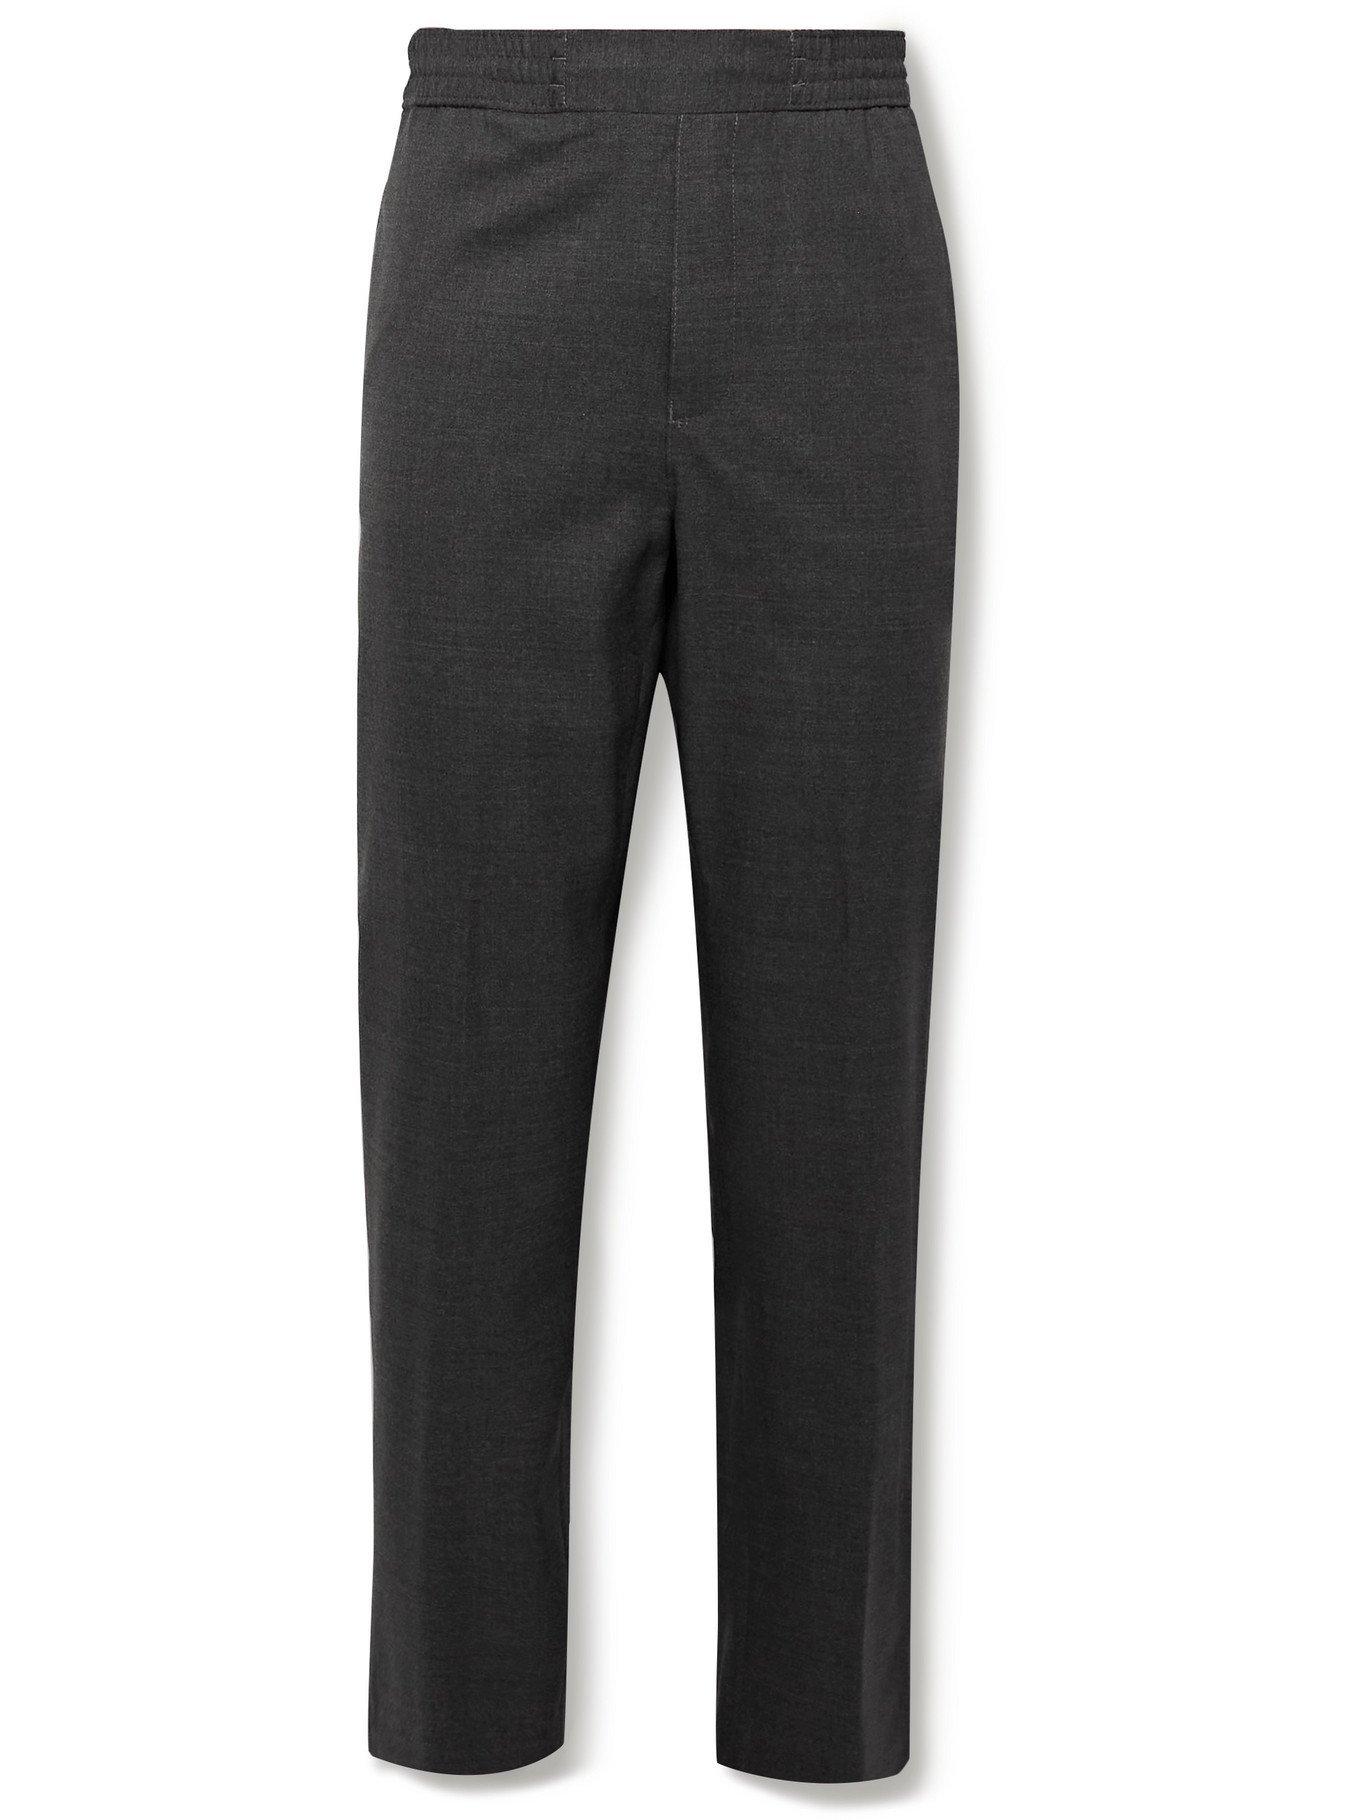 Photo: ACNE STUDIOS - Pismo Mélange Wool Trousers - Gray